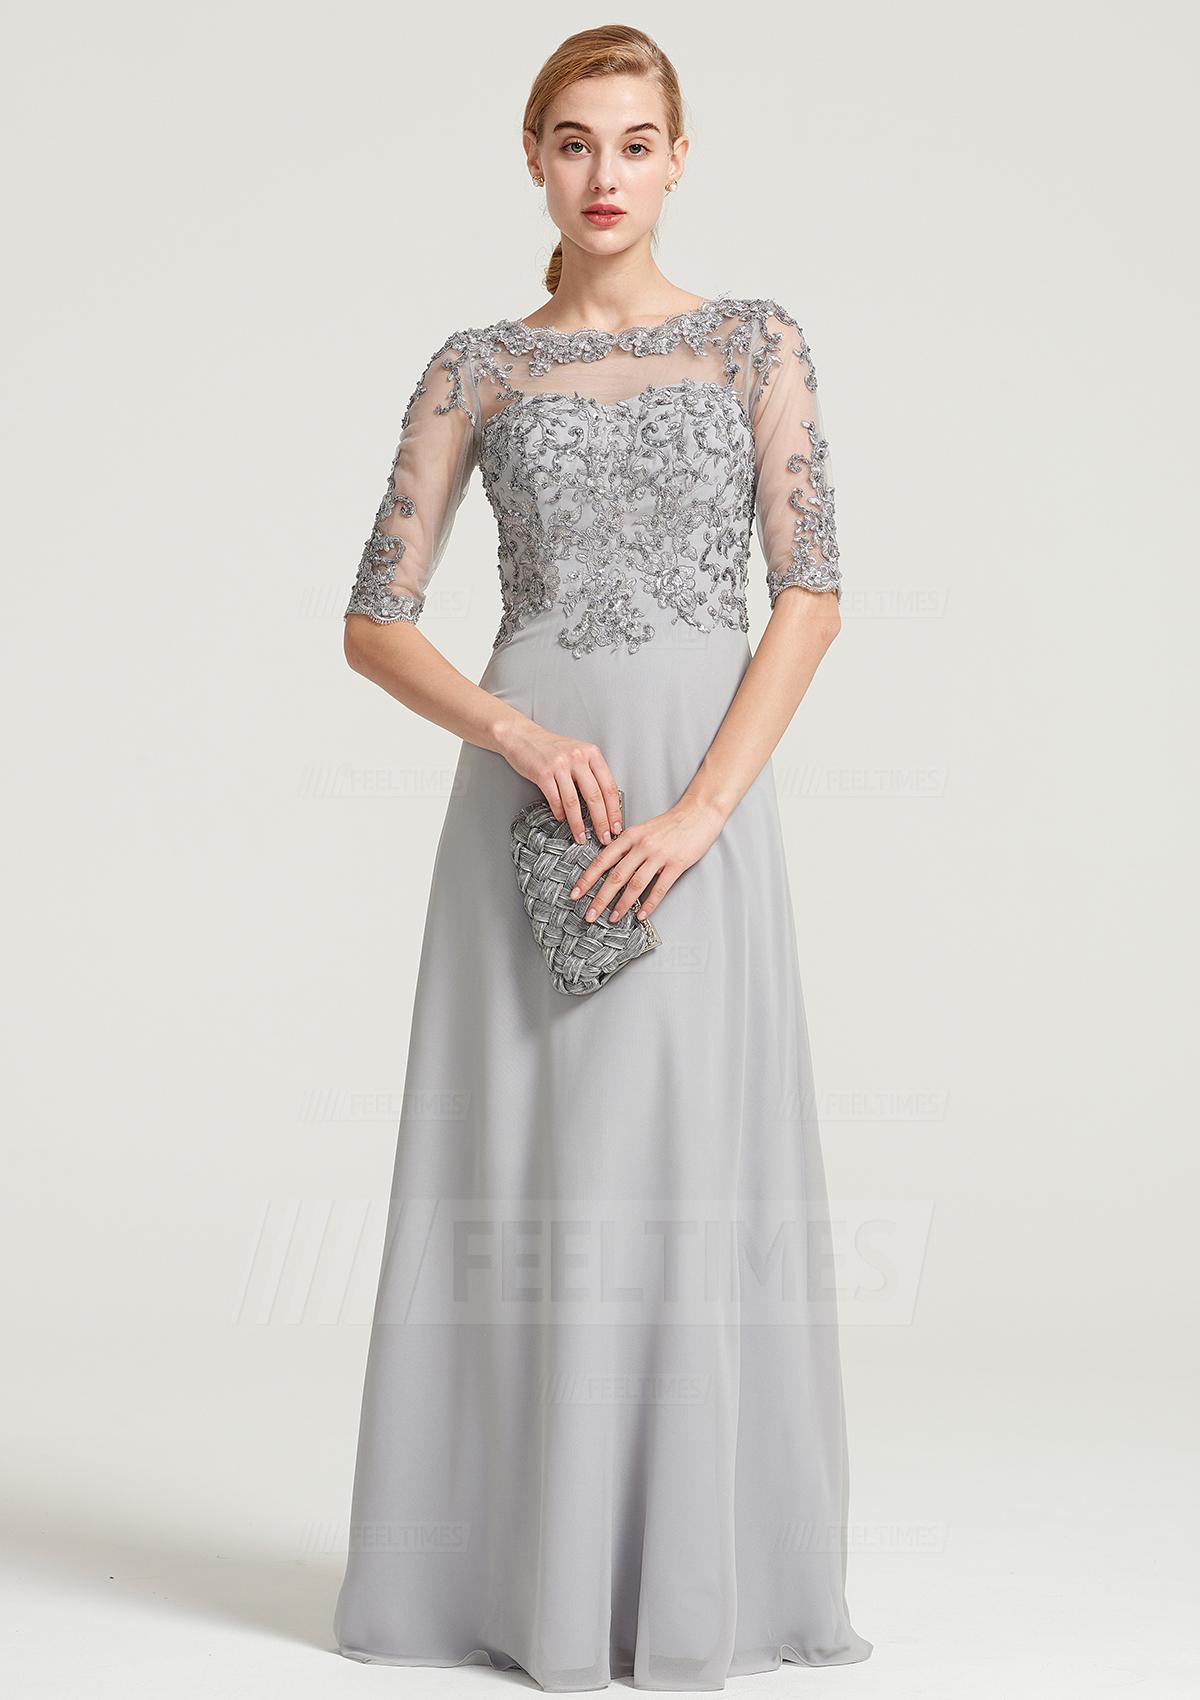 dbff52bb21cf1 A-Line/Princess Bateau Half Sleeve Long/Floor-Length Chiffon Dress ...